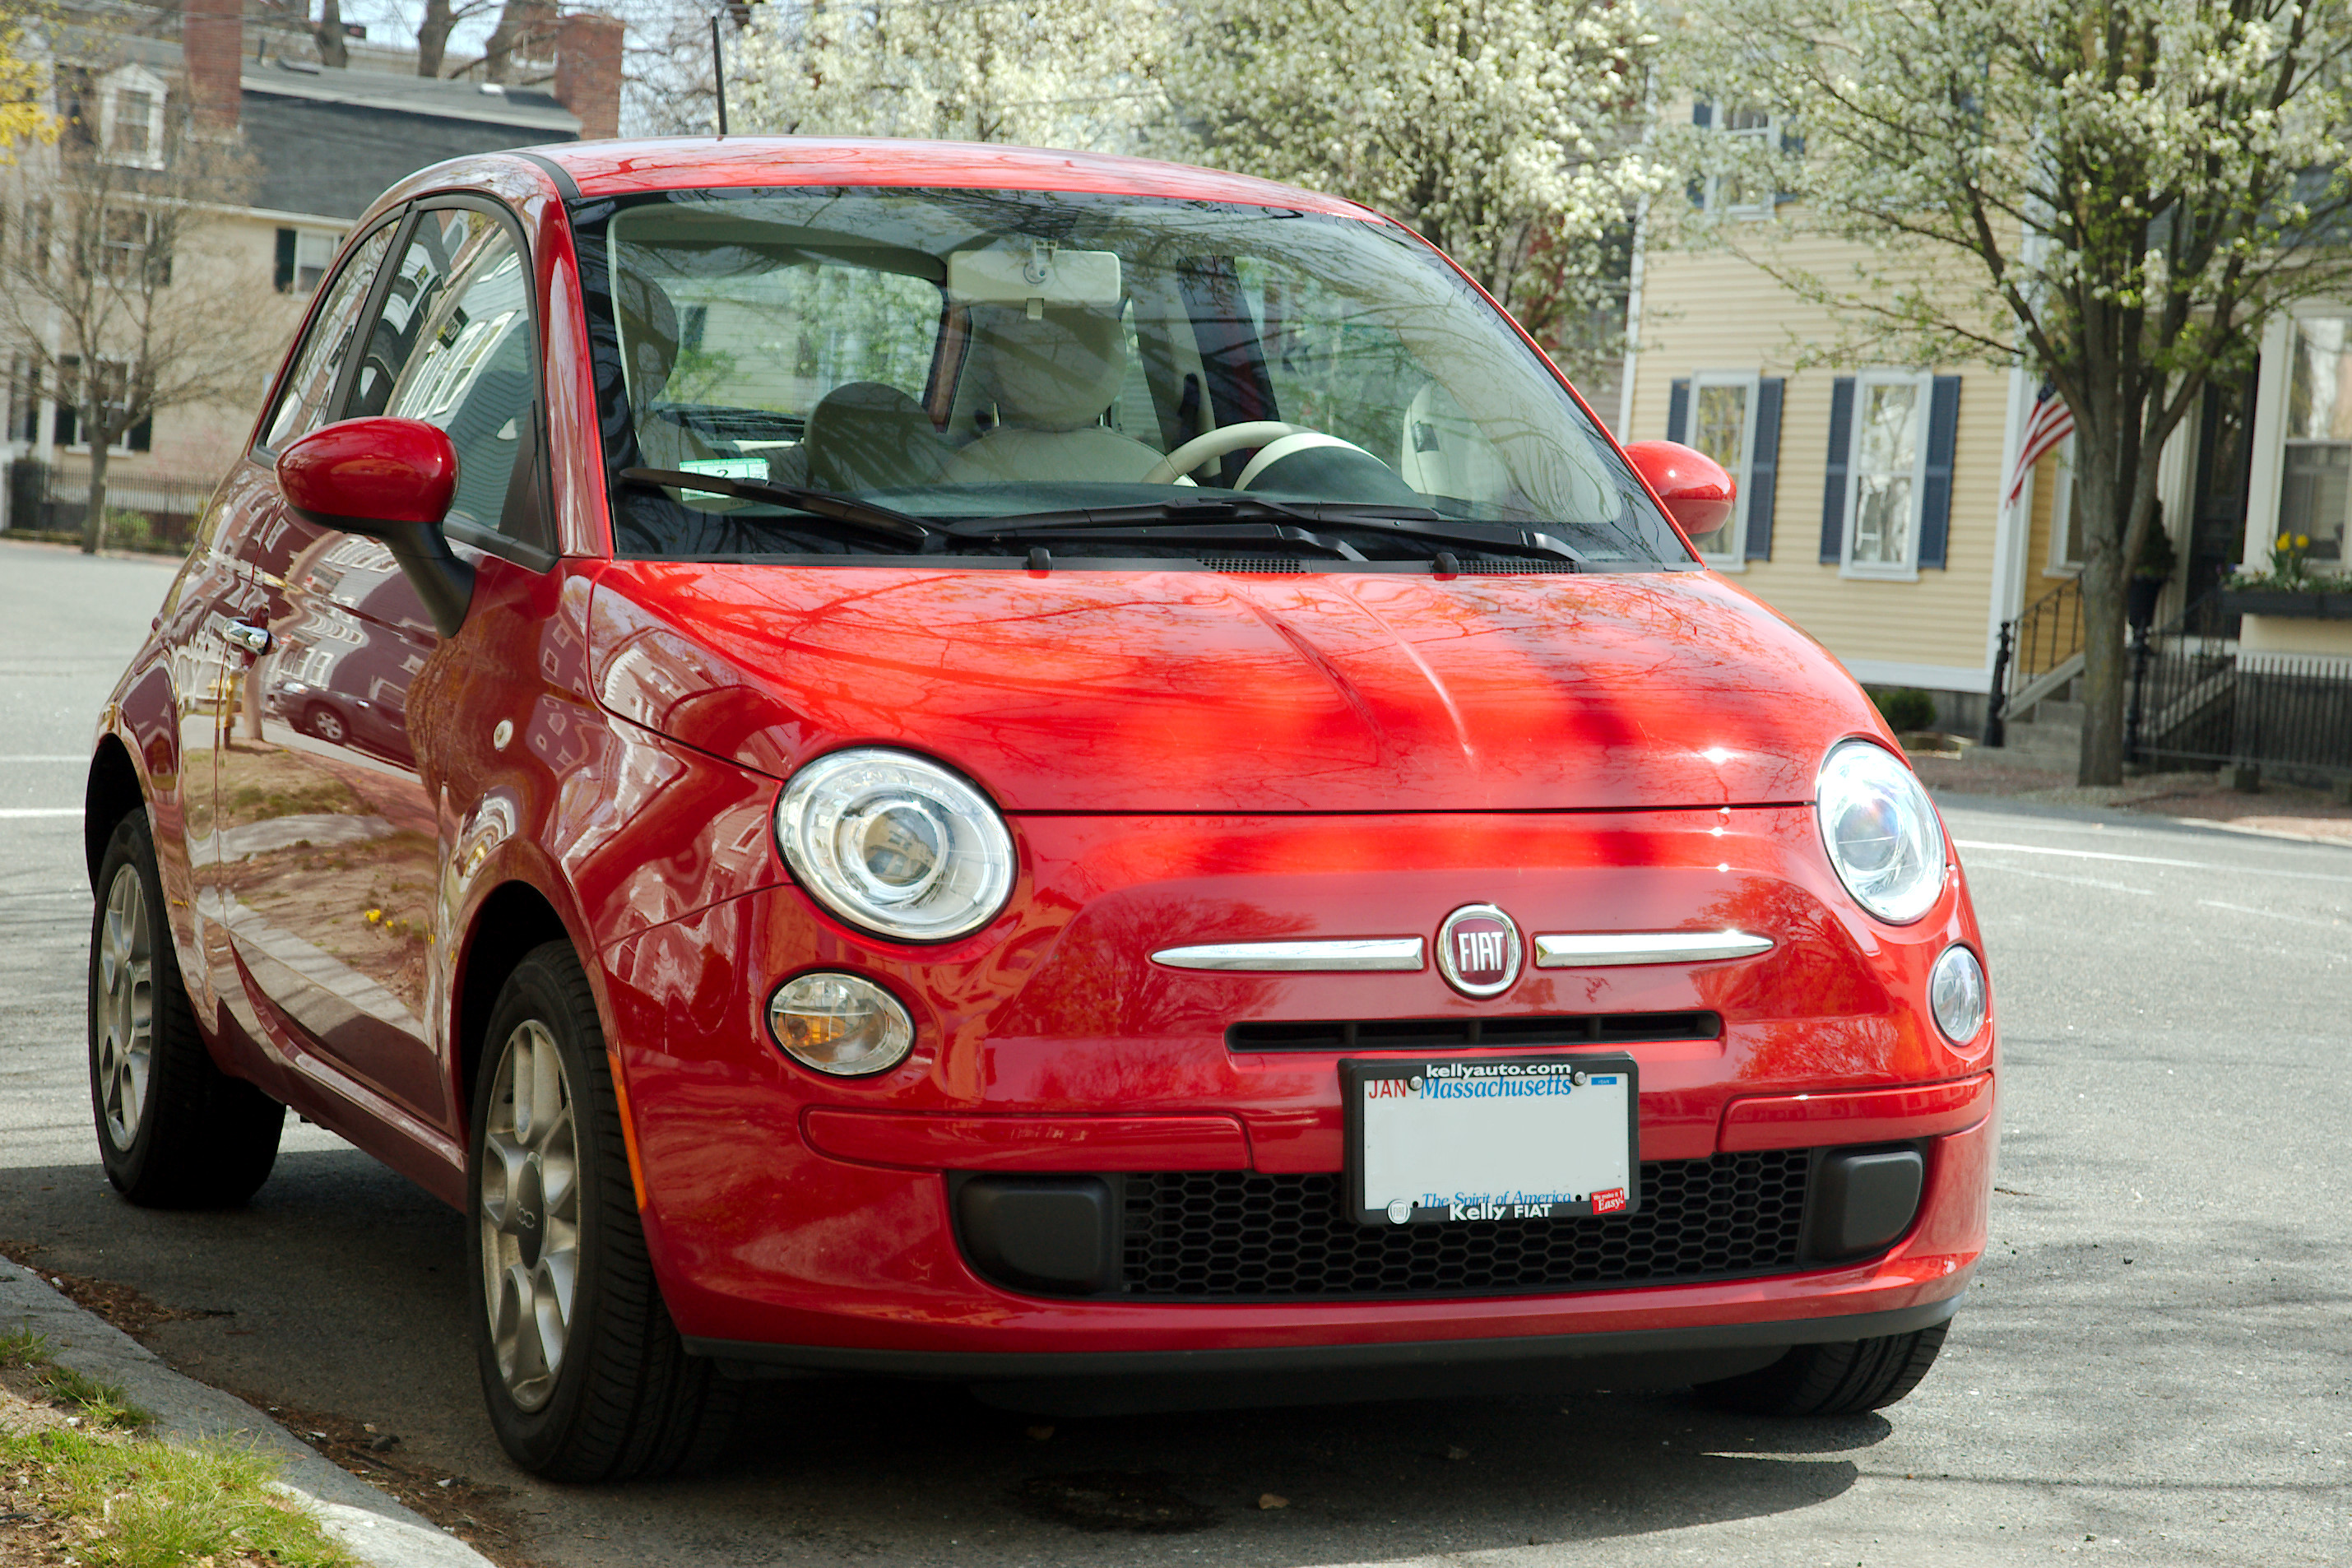 File:Fiat 500 (2007) - Front.jpg - Wikimedia Commons